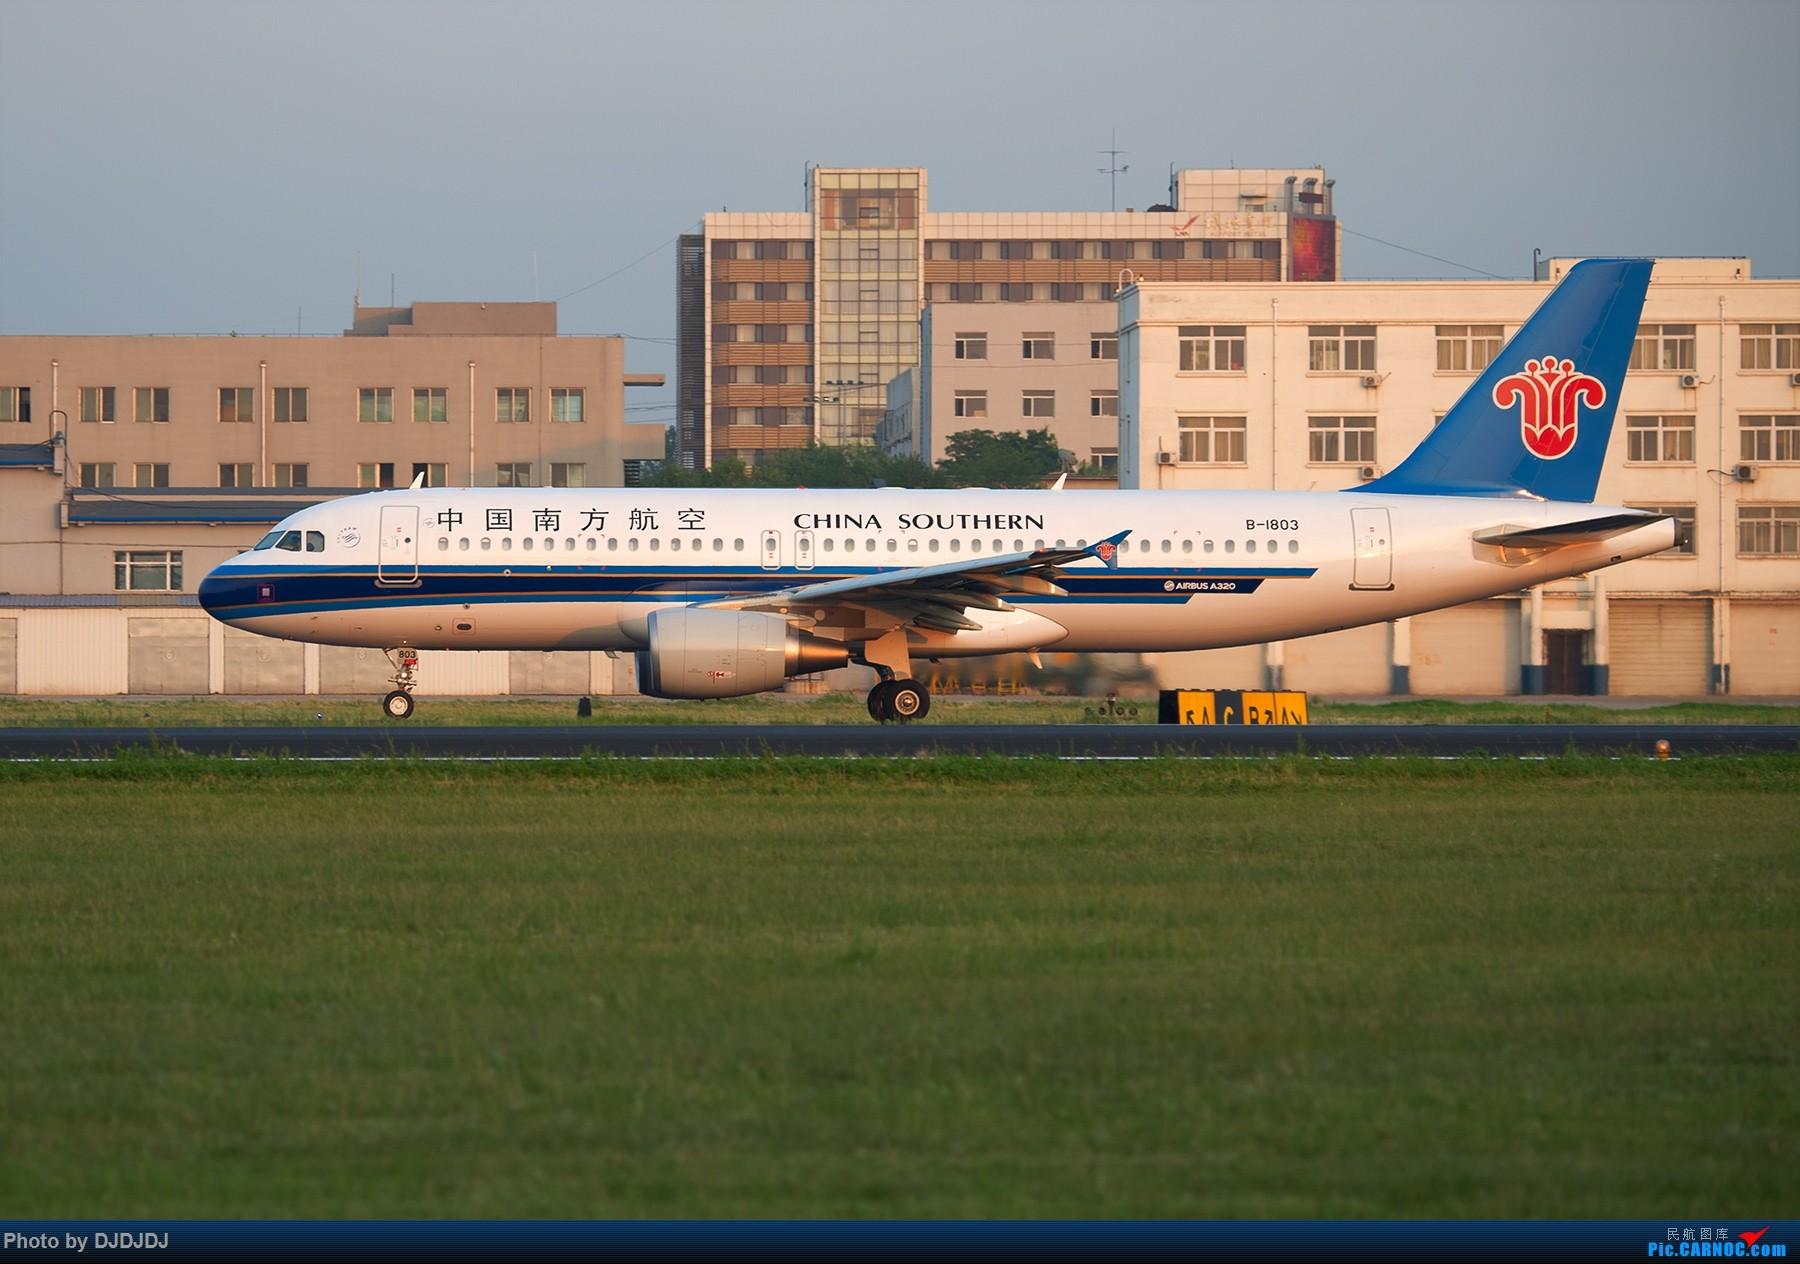 Re:[原创]【BLDDQ--深圳打机队】沈阳好温暖--想念北方的花 AIRBUS A320-200 B-1803 中国沈阳桃仙国际机场